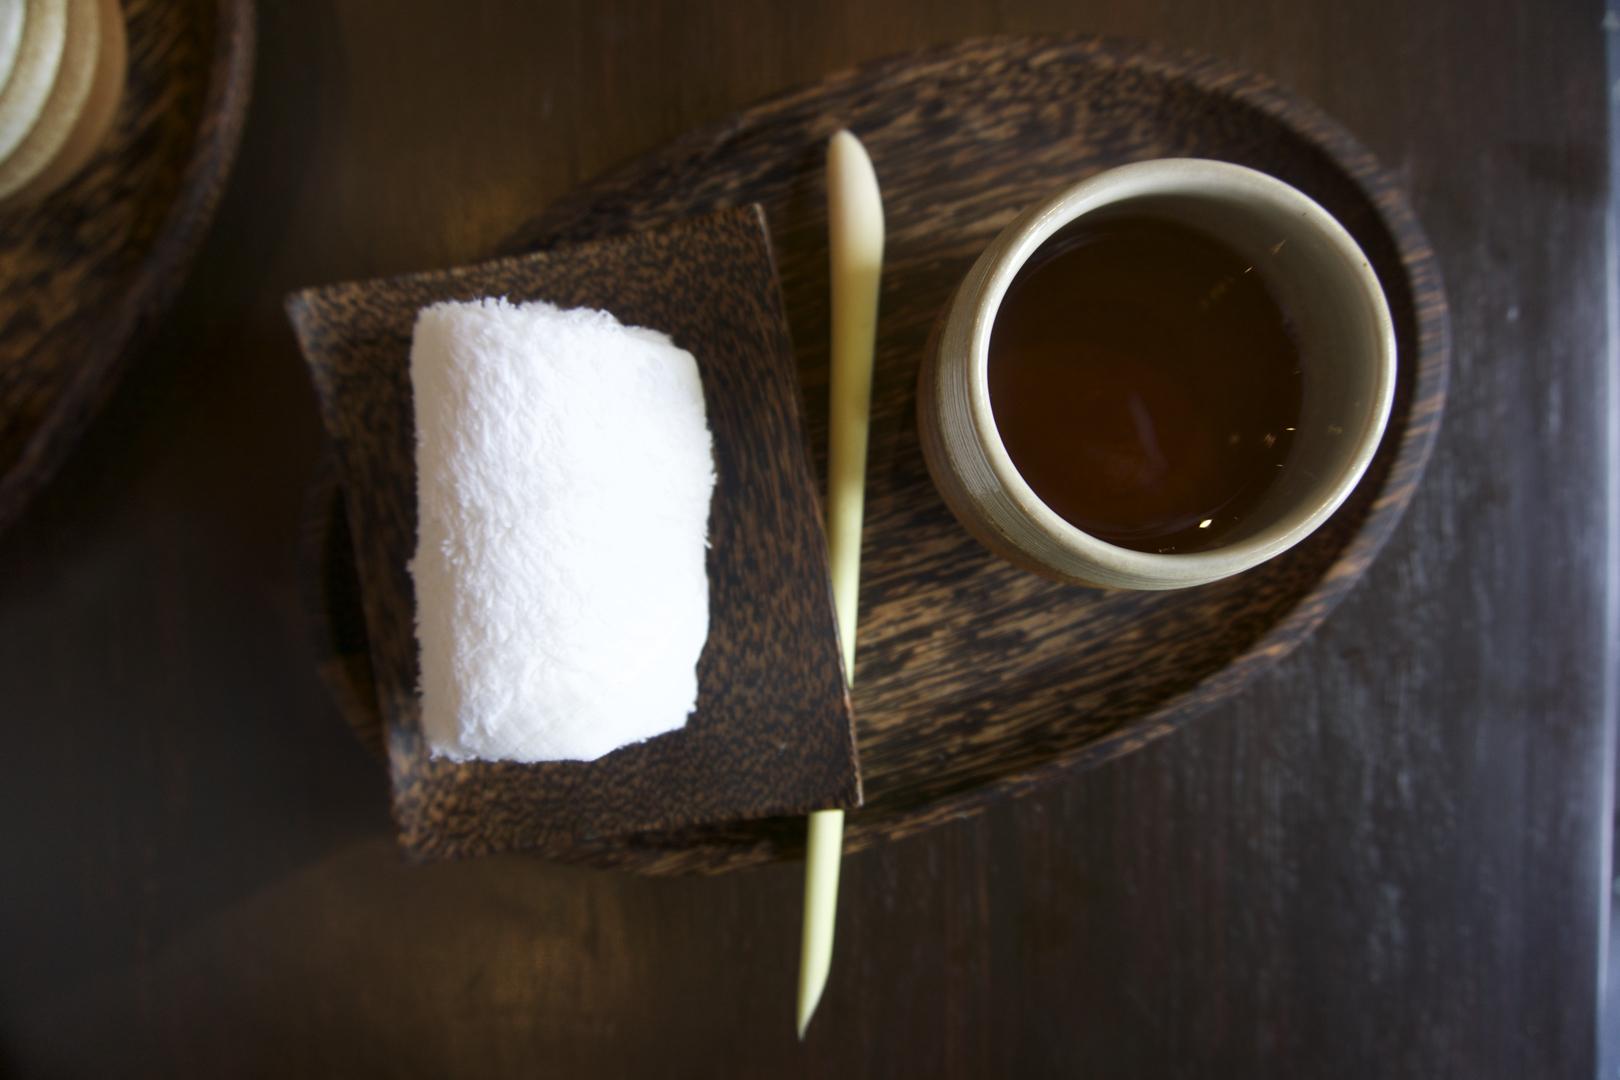 Post spa treatment tea